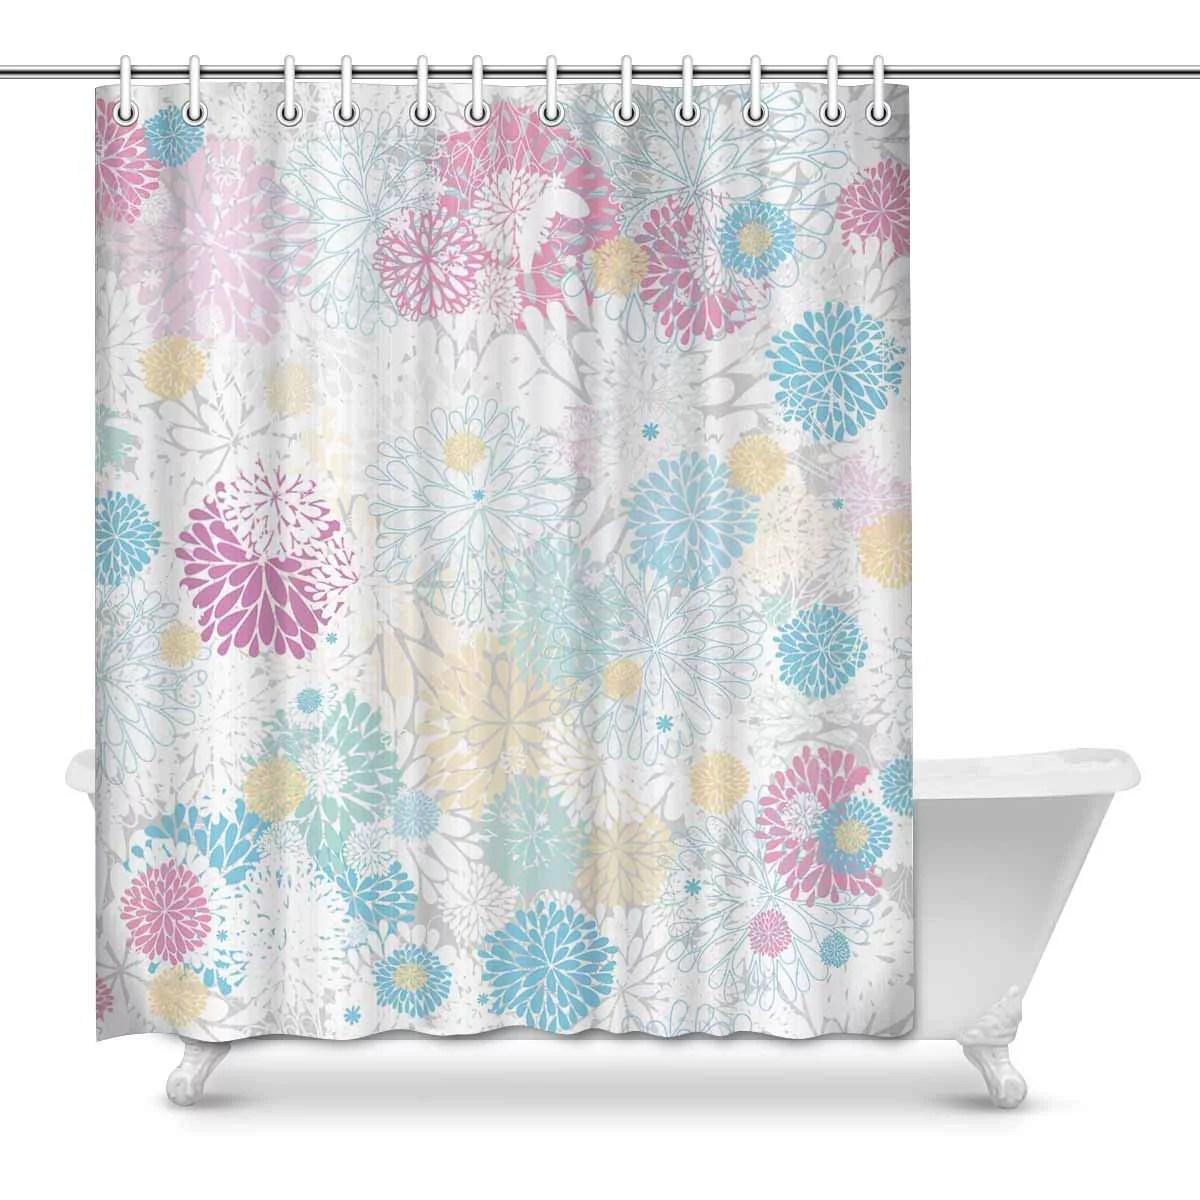 mkhert floral chrysanthemums daisy light blue pink house decor shower curtain bathroom decorative fabric bath curtain set rings 60x72 inch